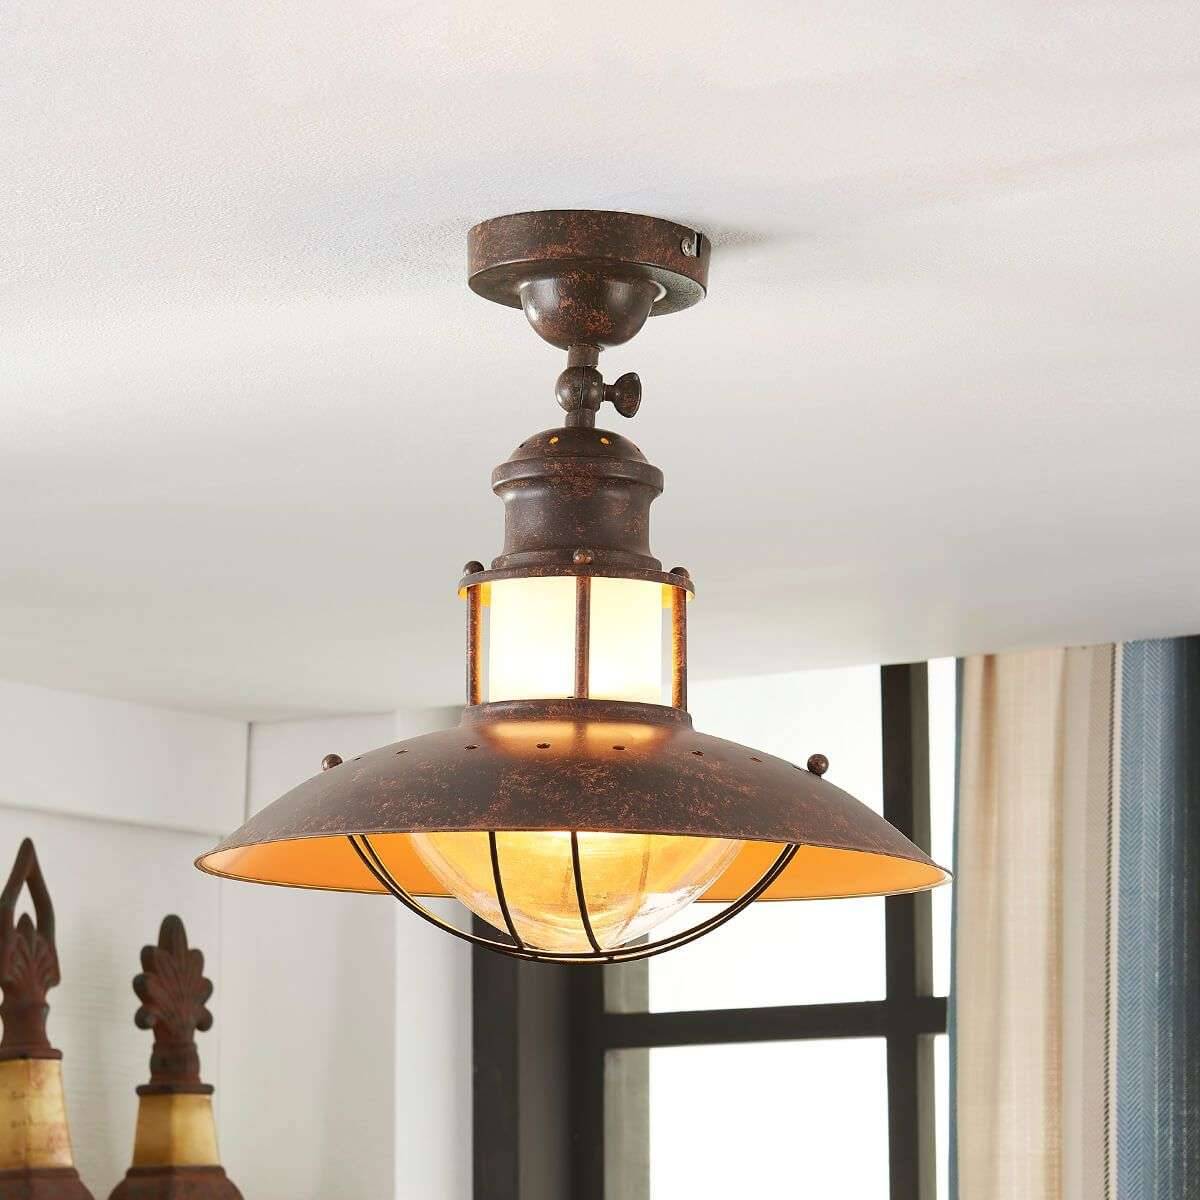 rustic ceiling lights. Rustic Ceiling Light Louisanne Lights Lights.ie